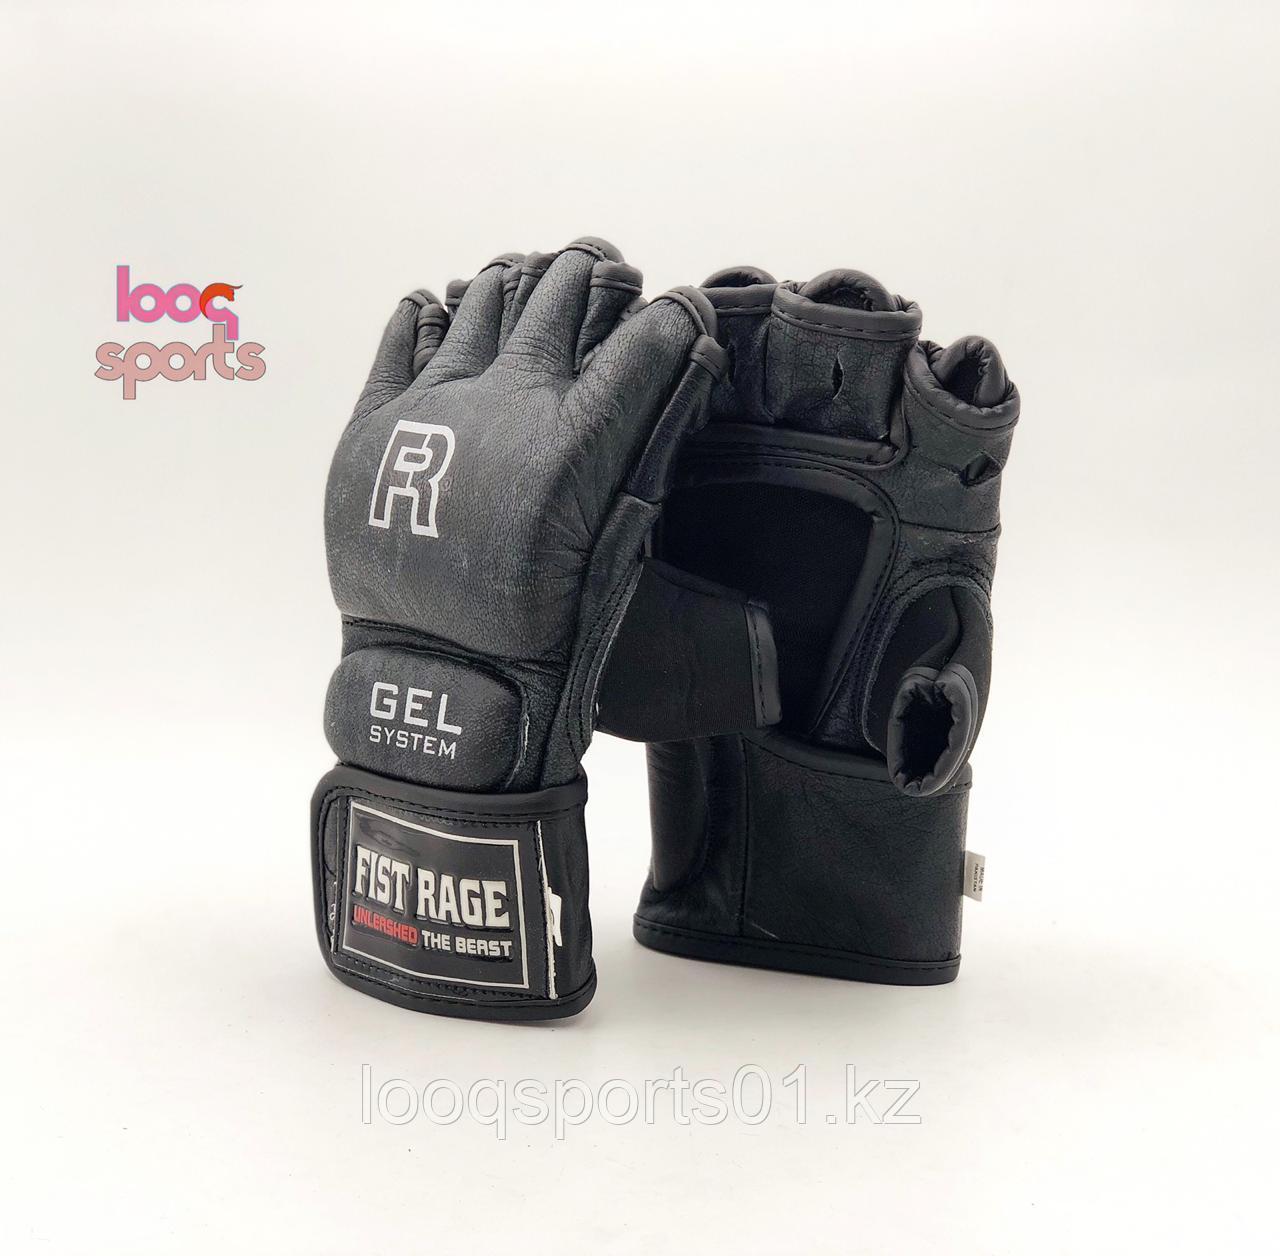 Перчатки для мма и единоборств кожа R